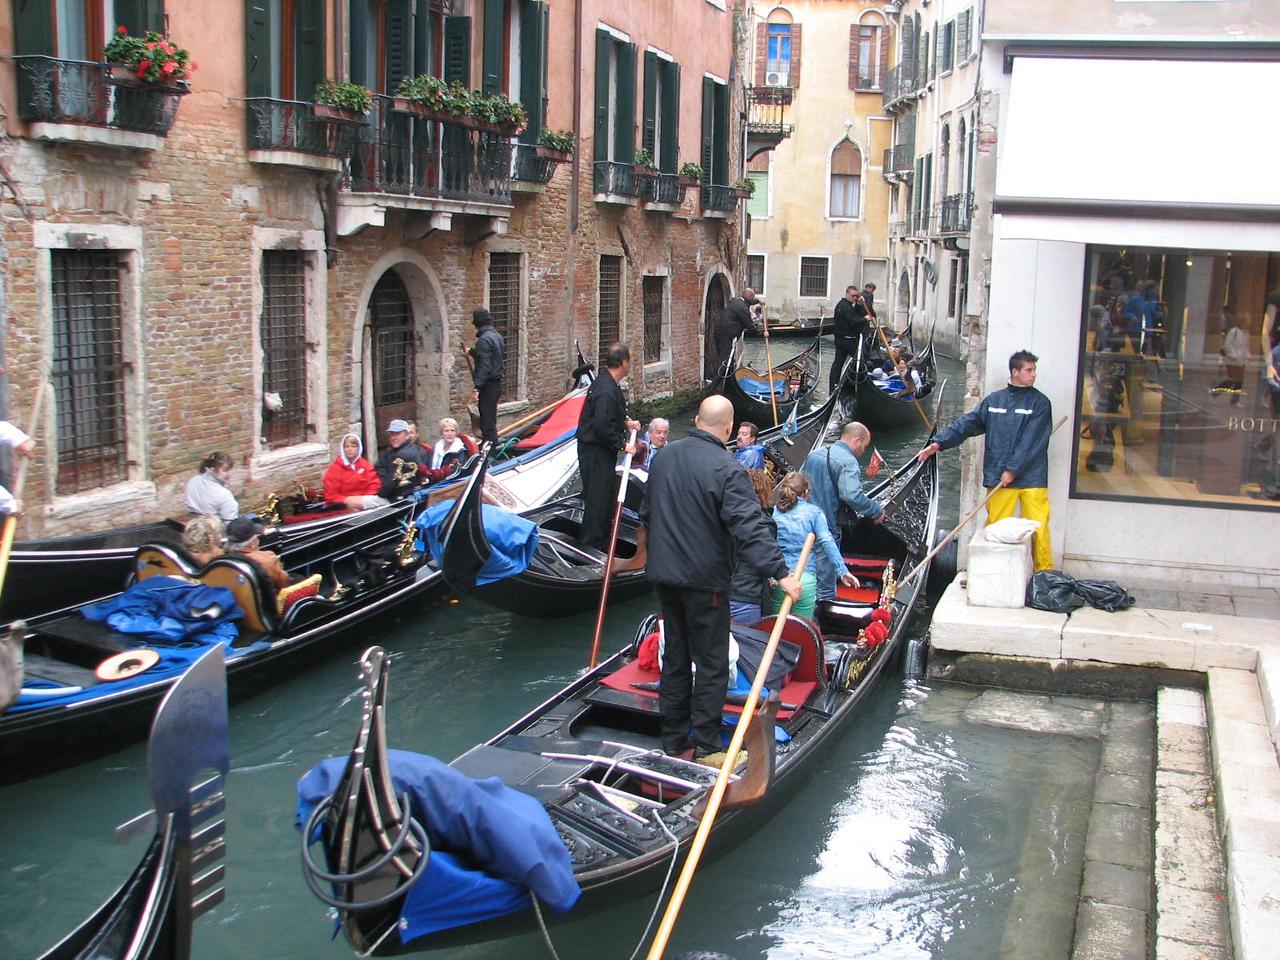 Traffic jam, Venetian style